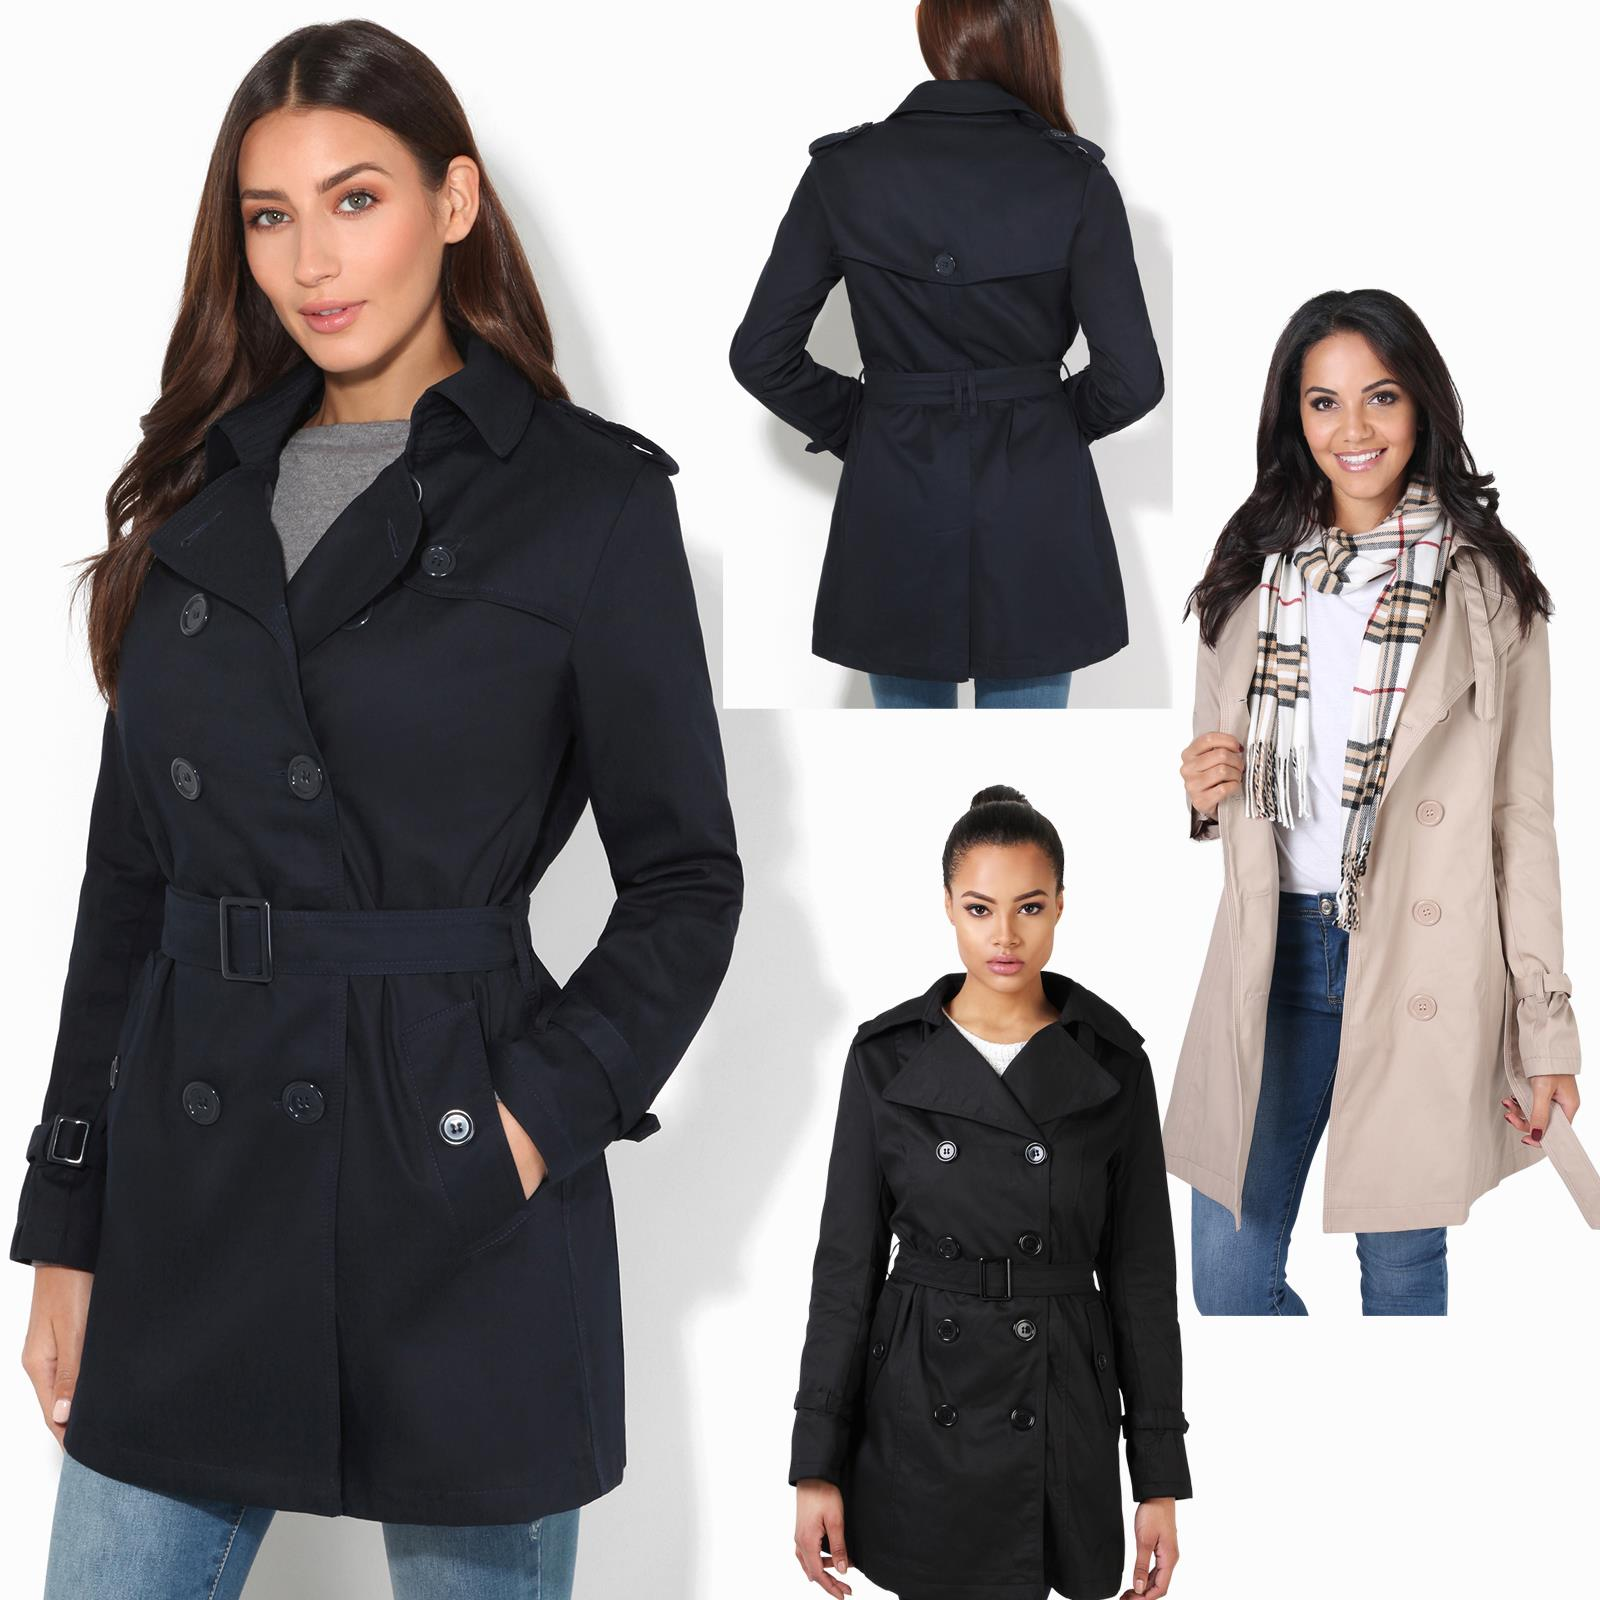 Winter Mantel Zu 36 Kurzmantel 46 Details Damen Trenchcoat Größen Jacke Klassischer Große W29YEDHI